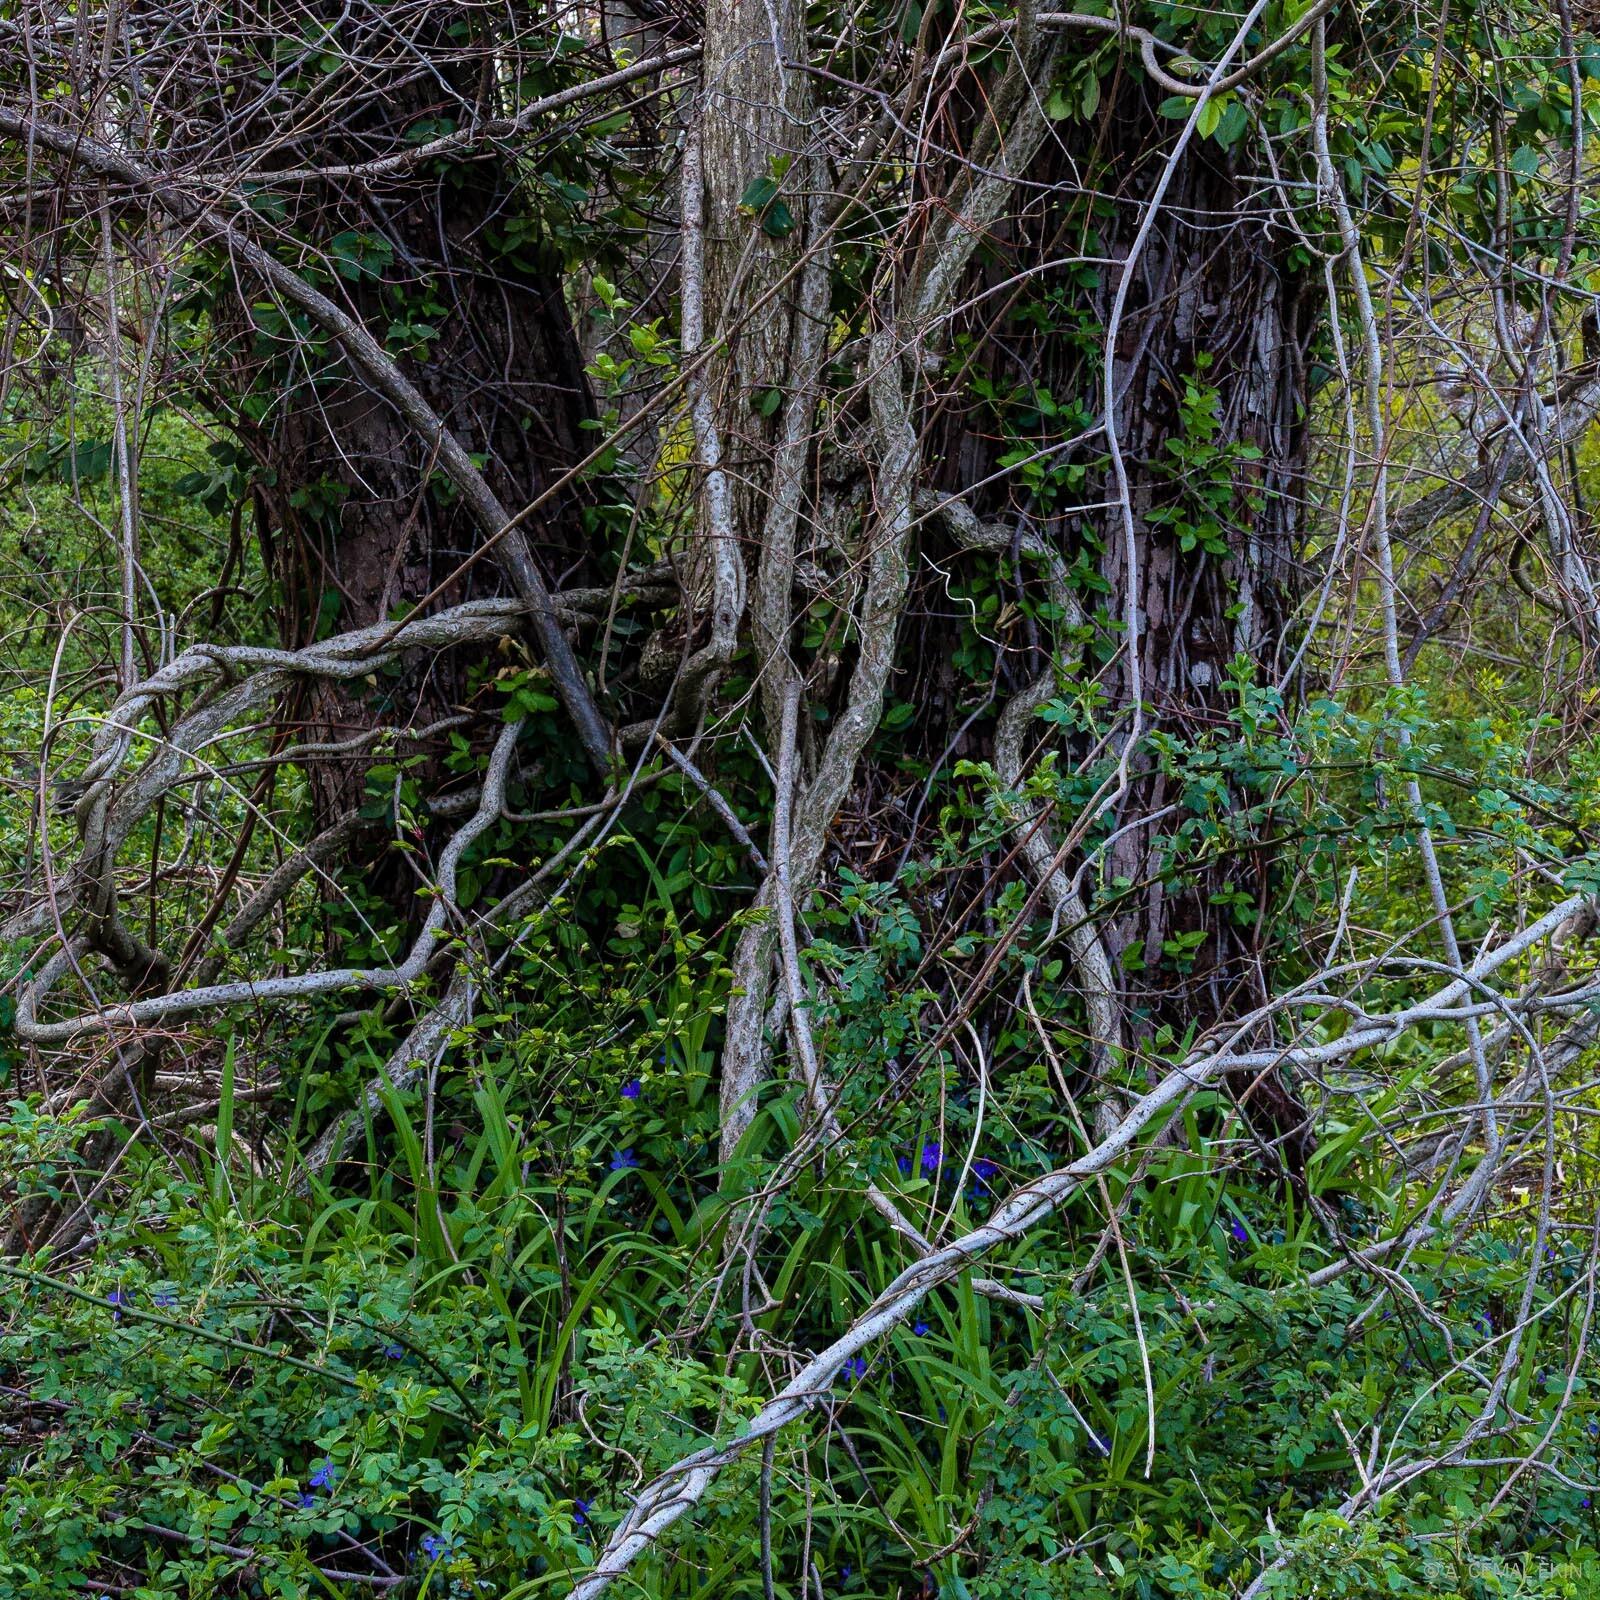 Peripheral colors in the wilderness next door